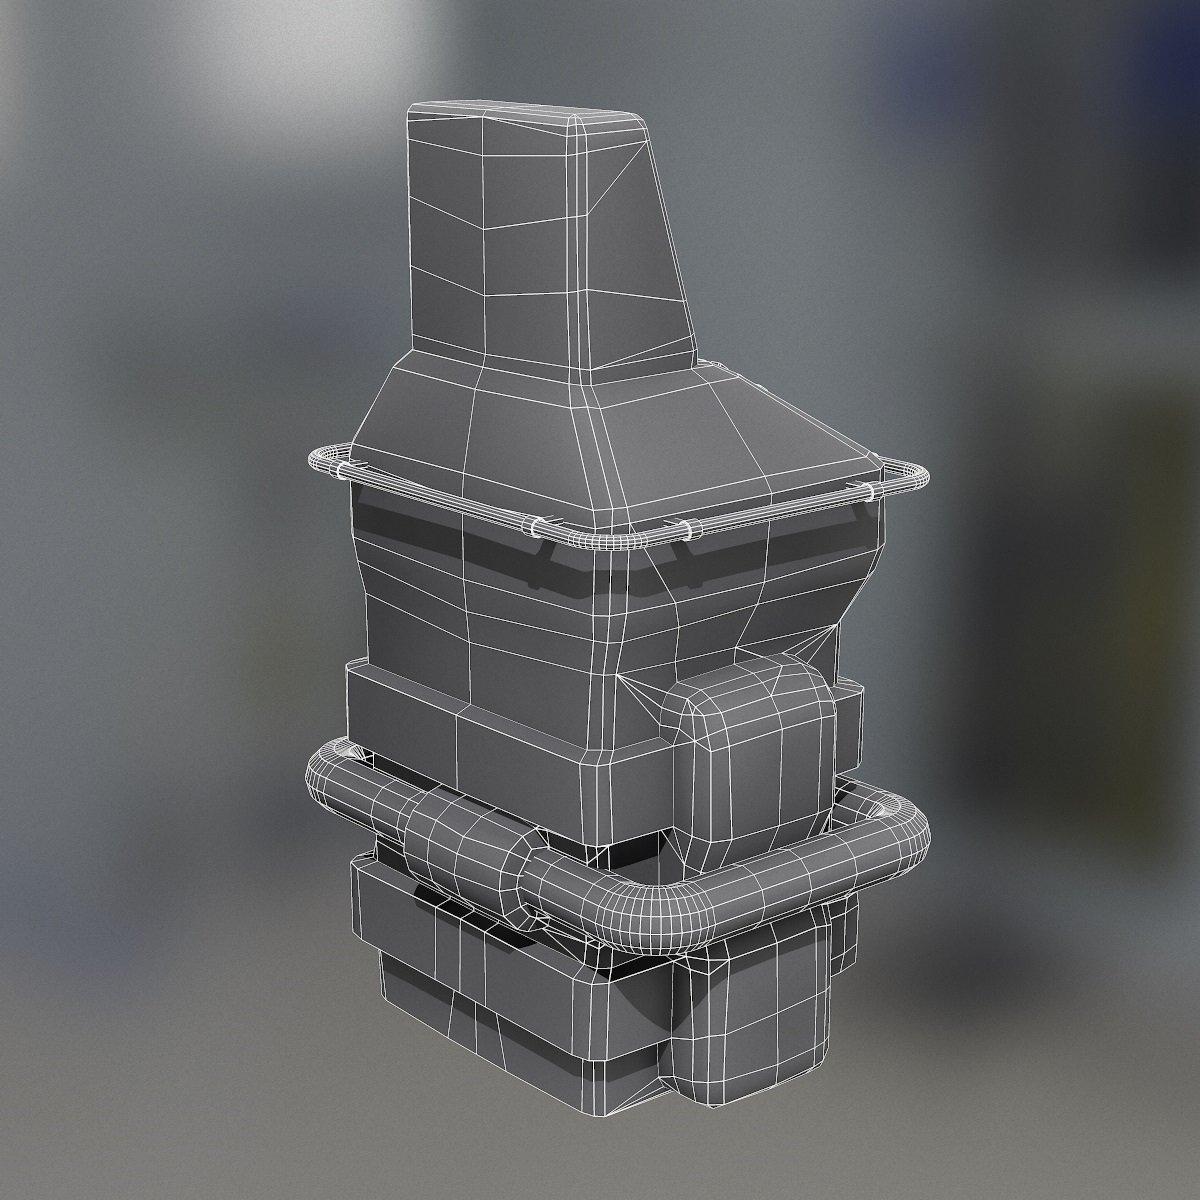 Retro Sci-Fi Console 3D Model in Other 3DExport